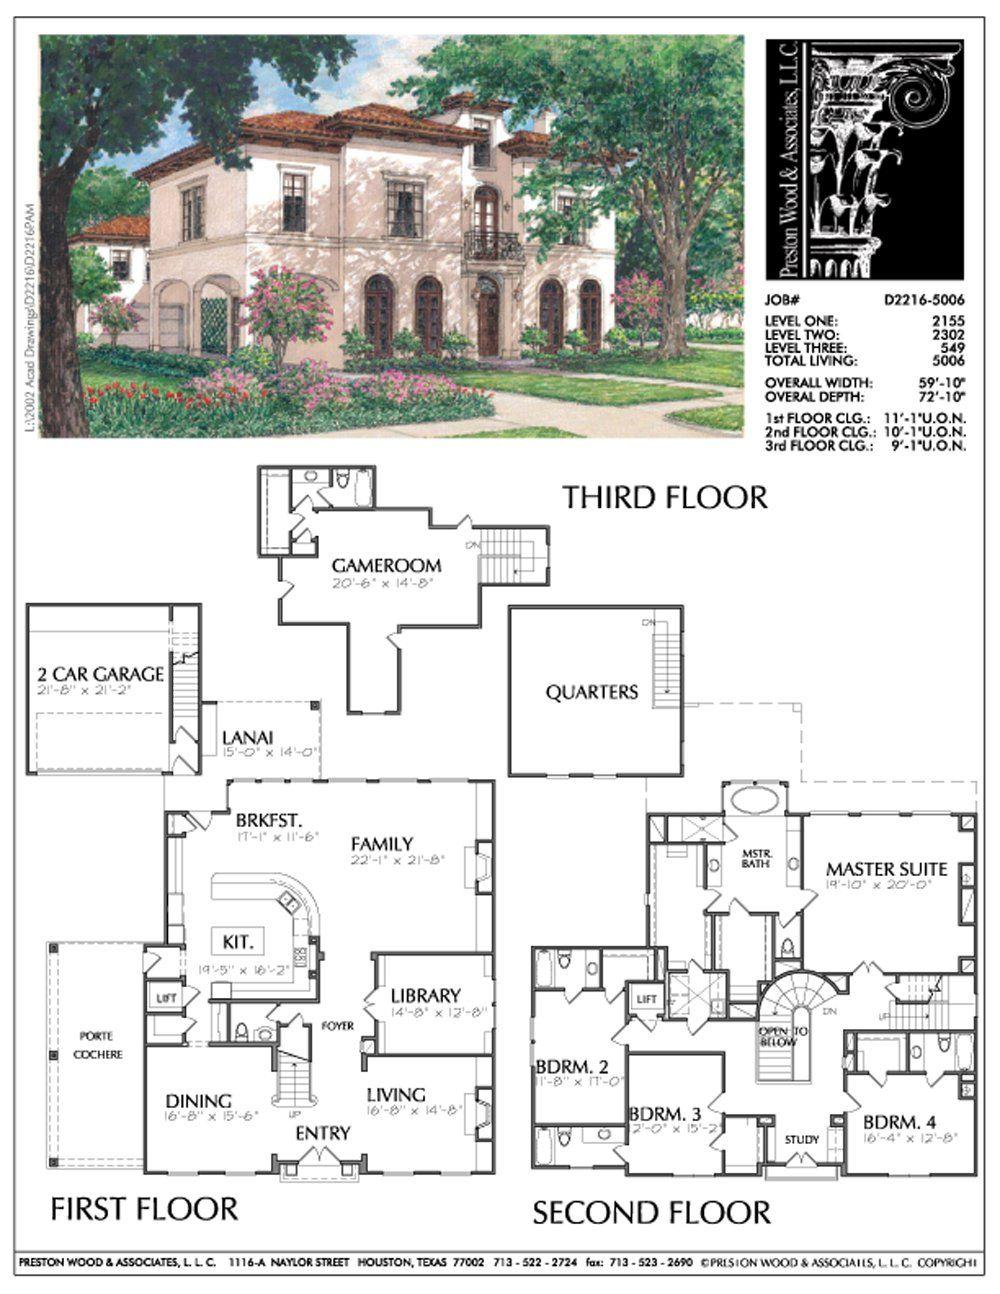 2 1 2 Story Urban Home Plan Ad2216 Mediterranean House Plans Mediterranean House Plans Spanish Style Sims House Plans